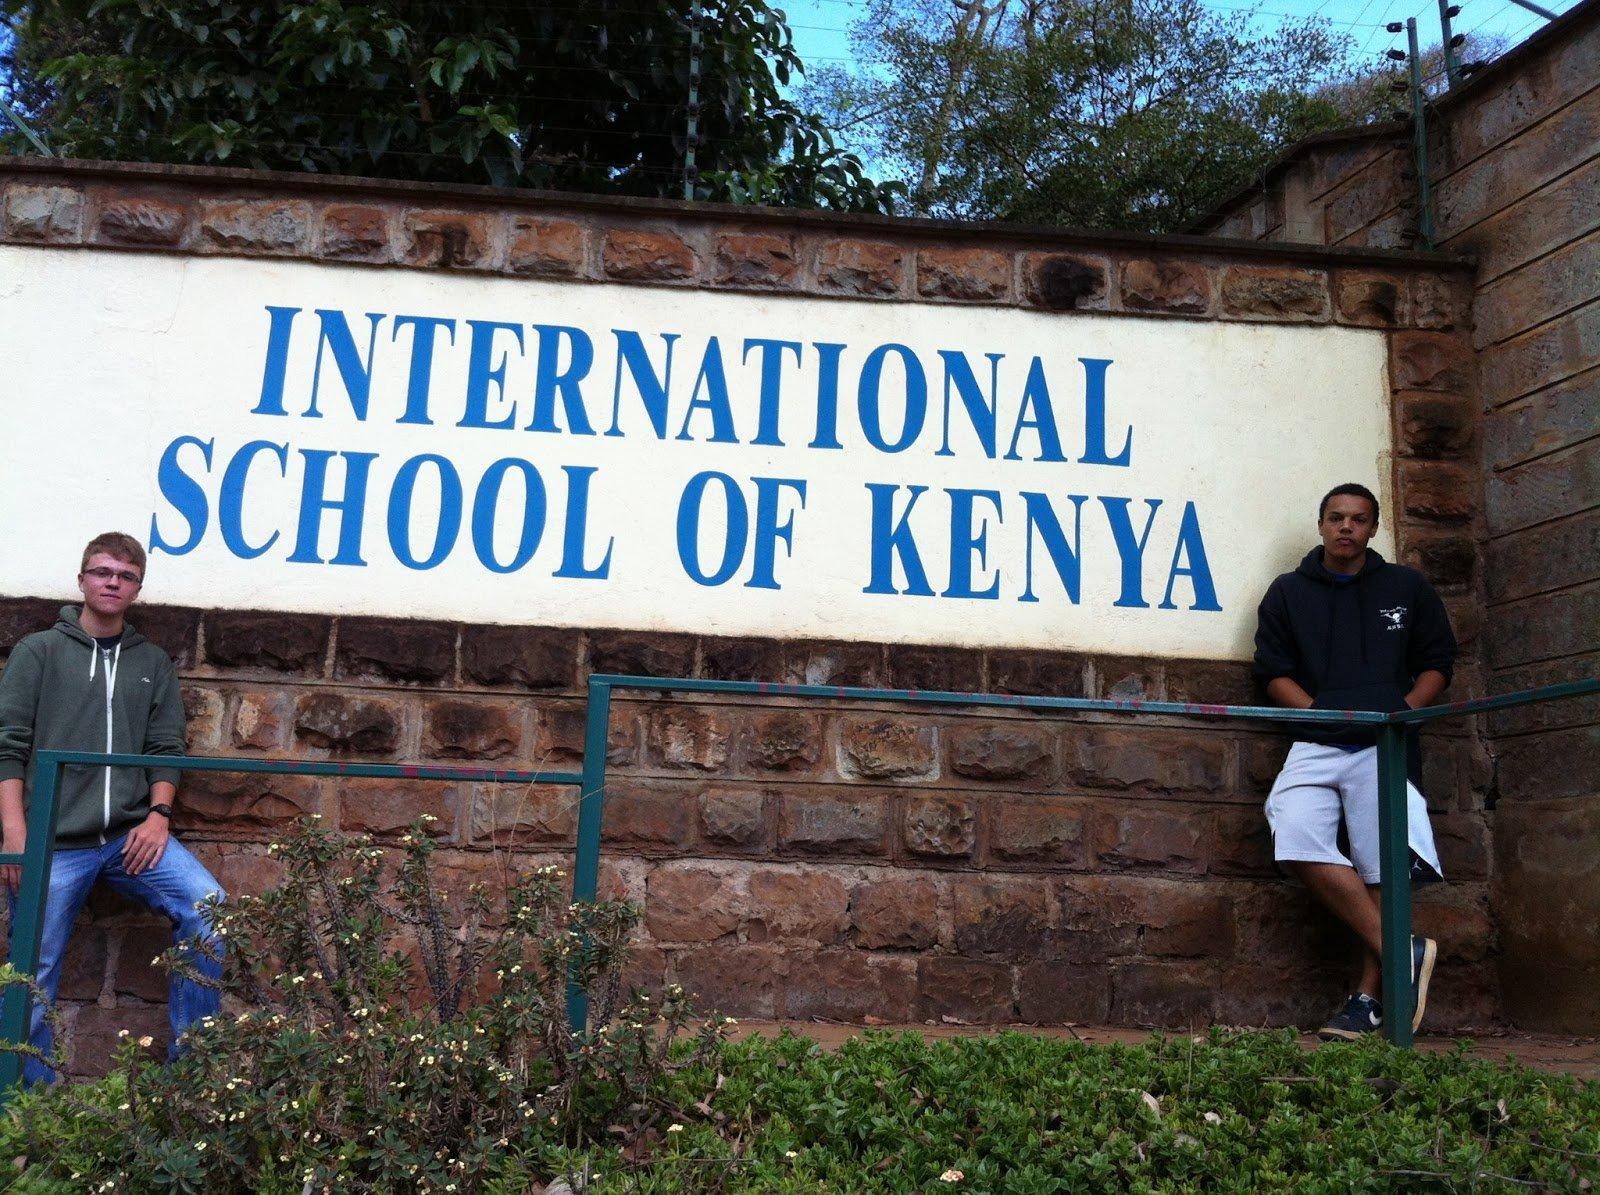 Kenya school of forex nairobi city